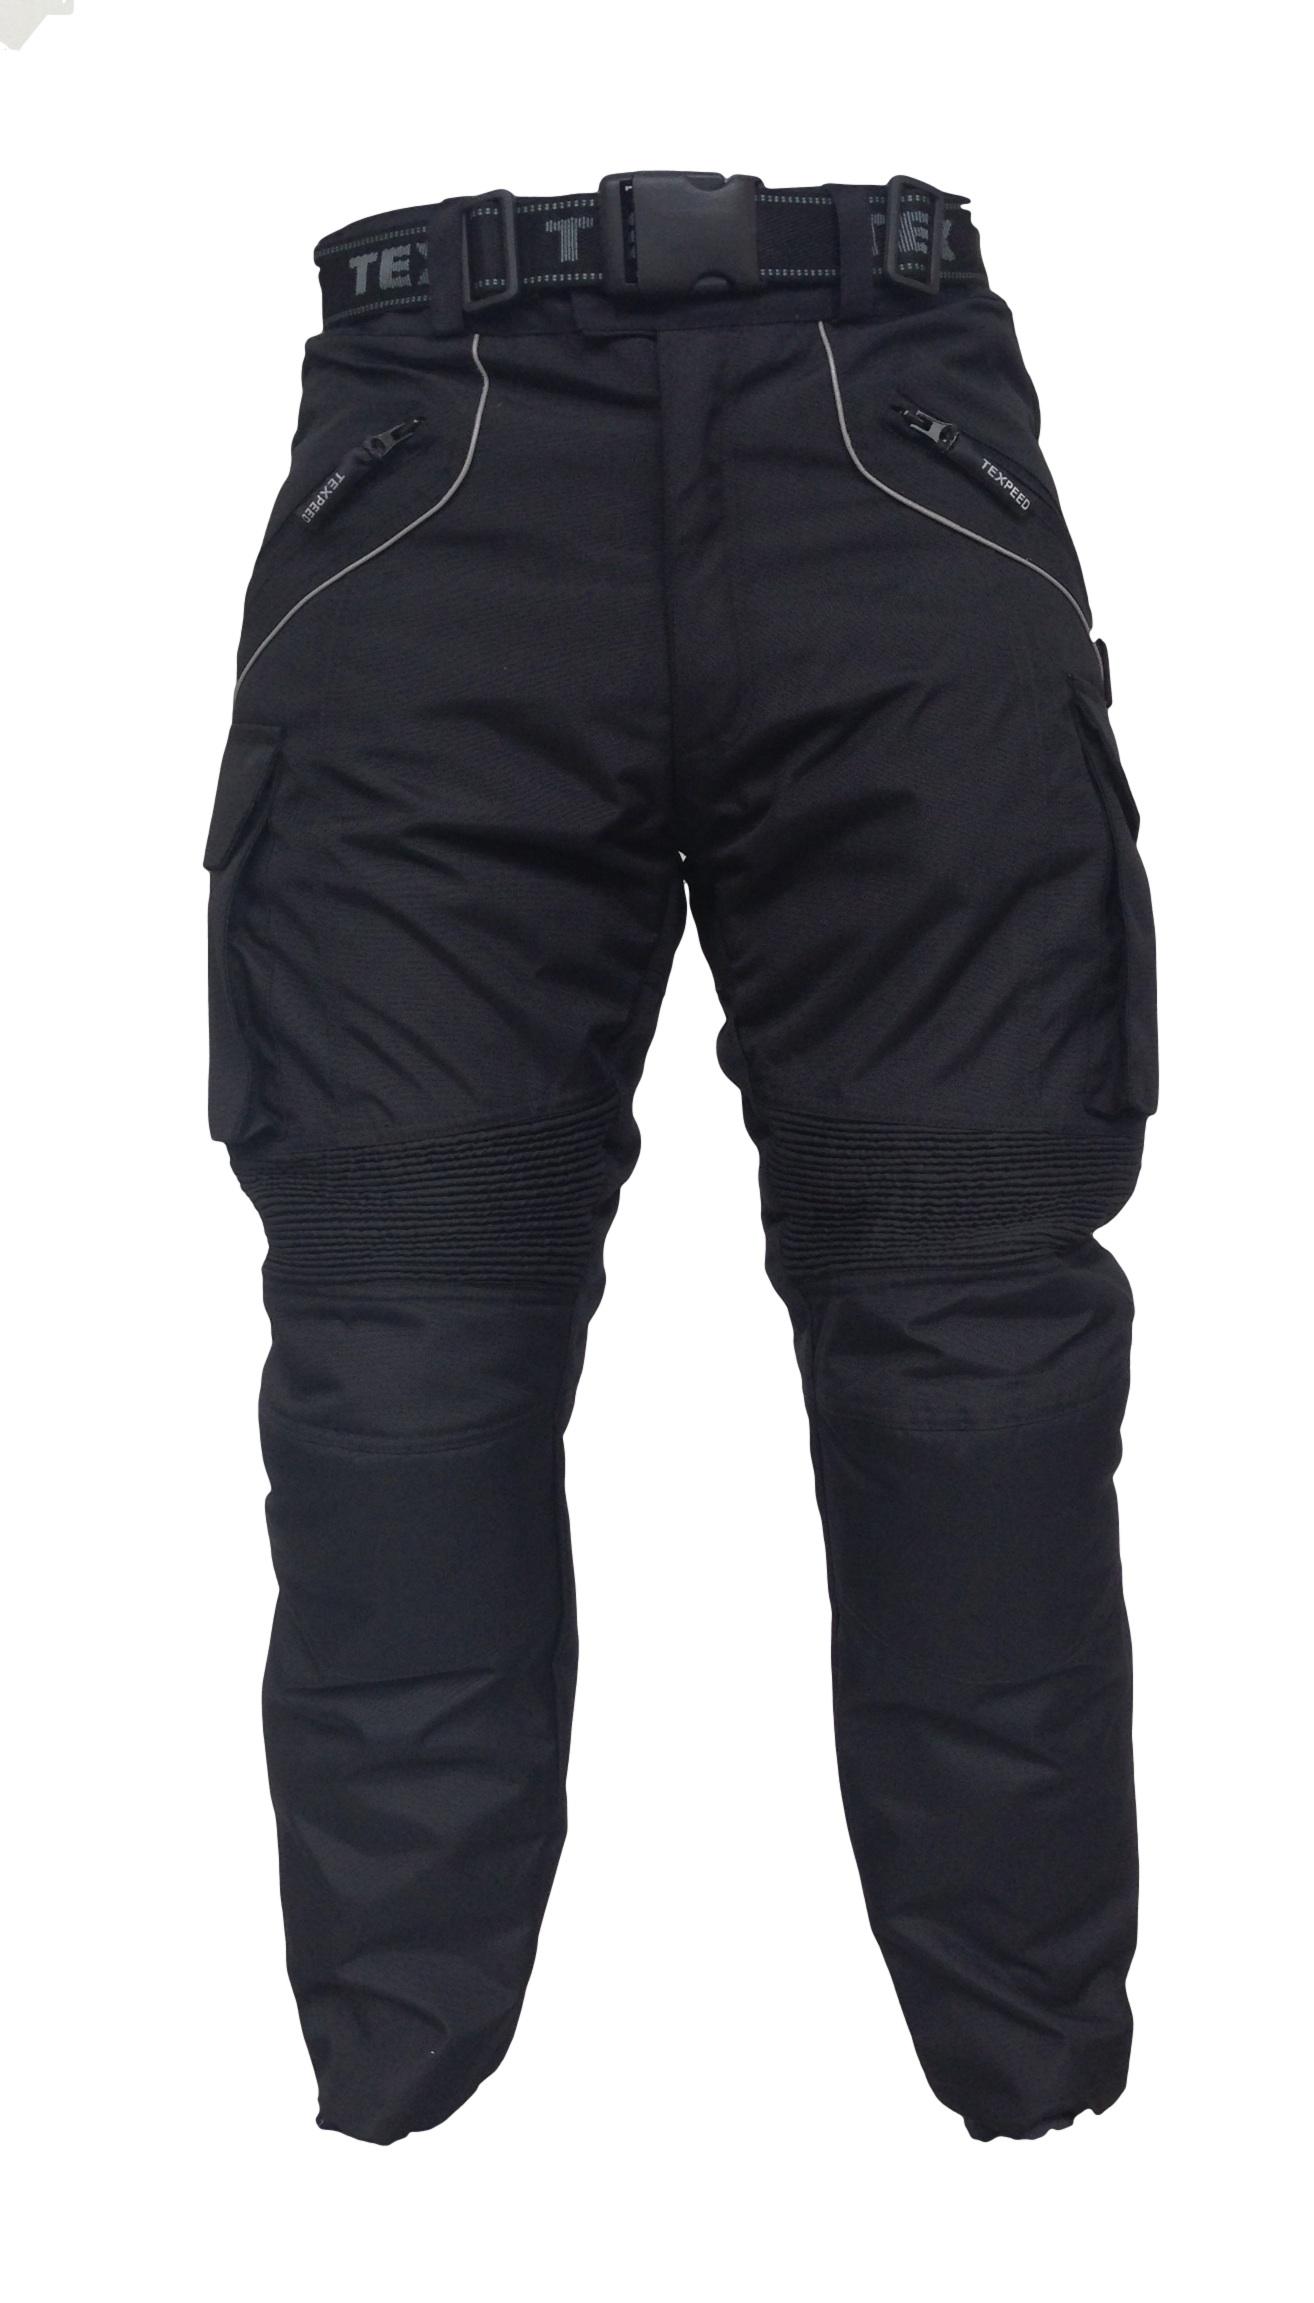 CE Armoured Waterproof Police Style Black Motorcycle Bike Trousers +Inner Lining